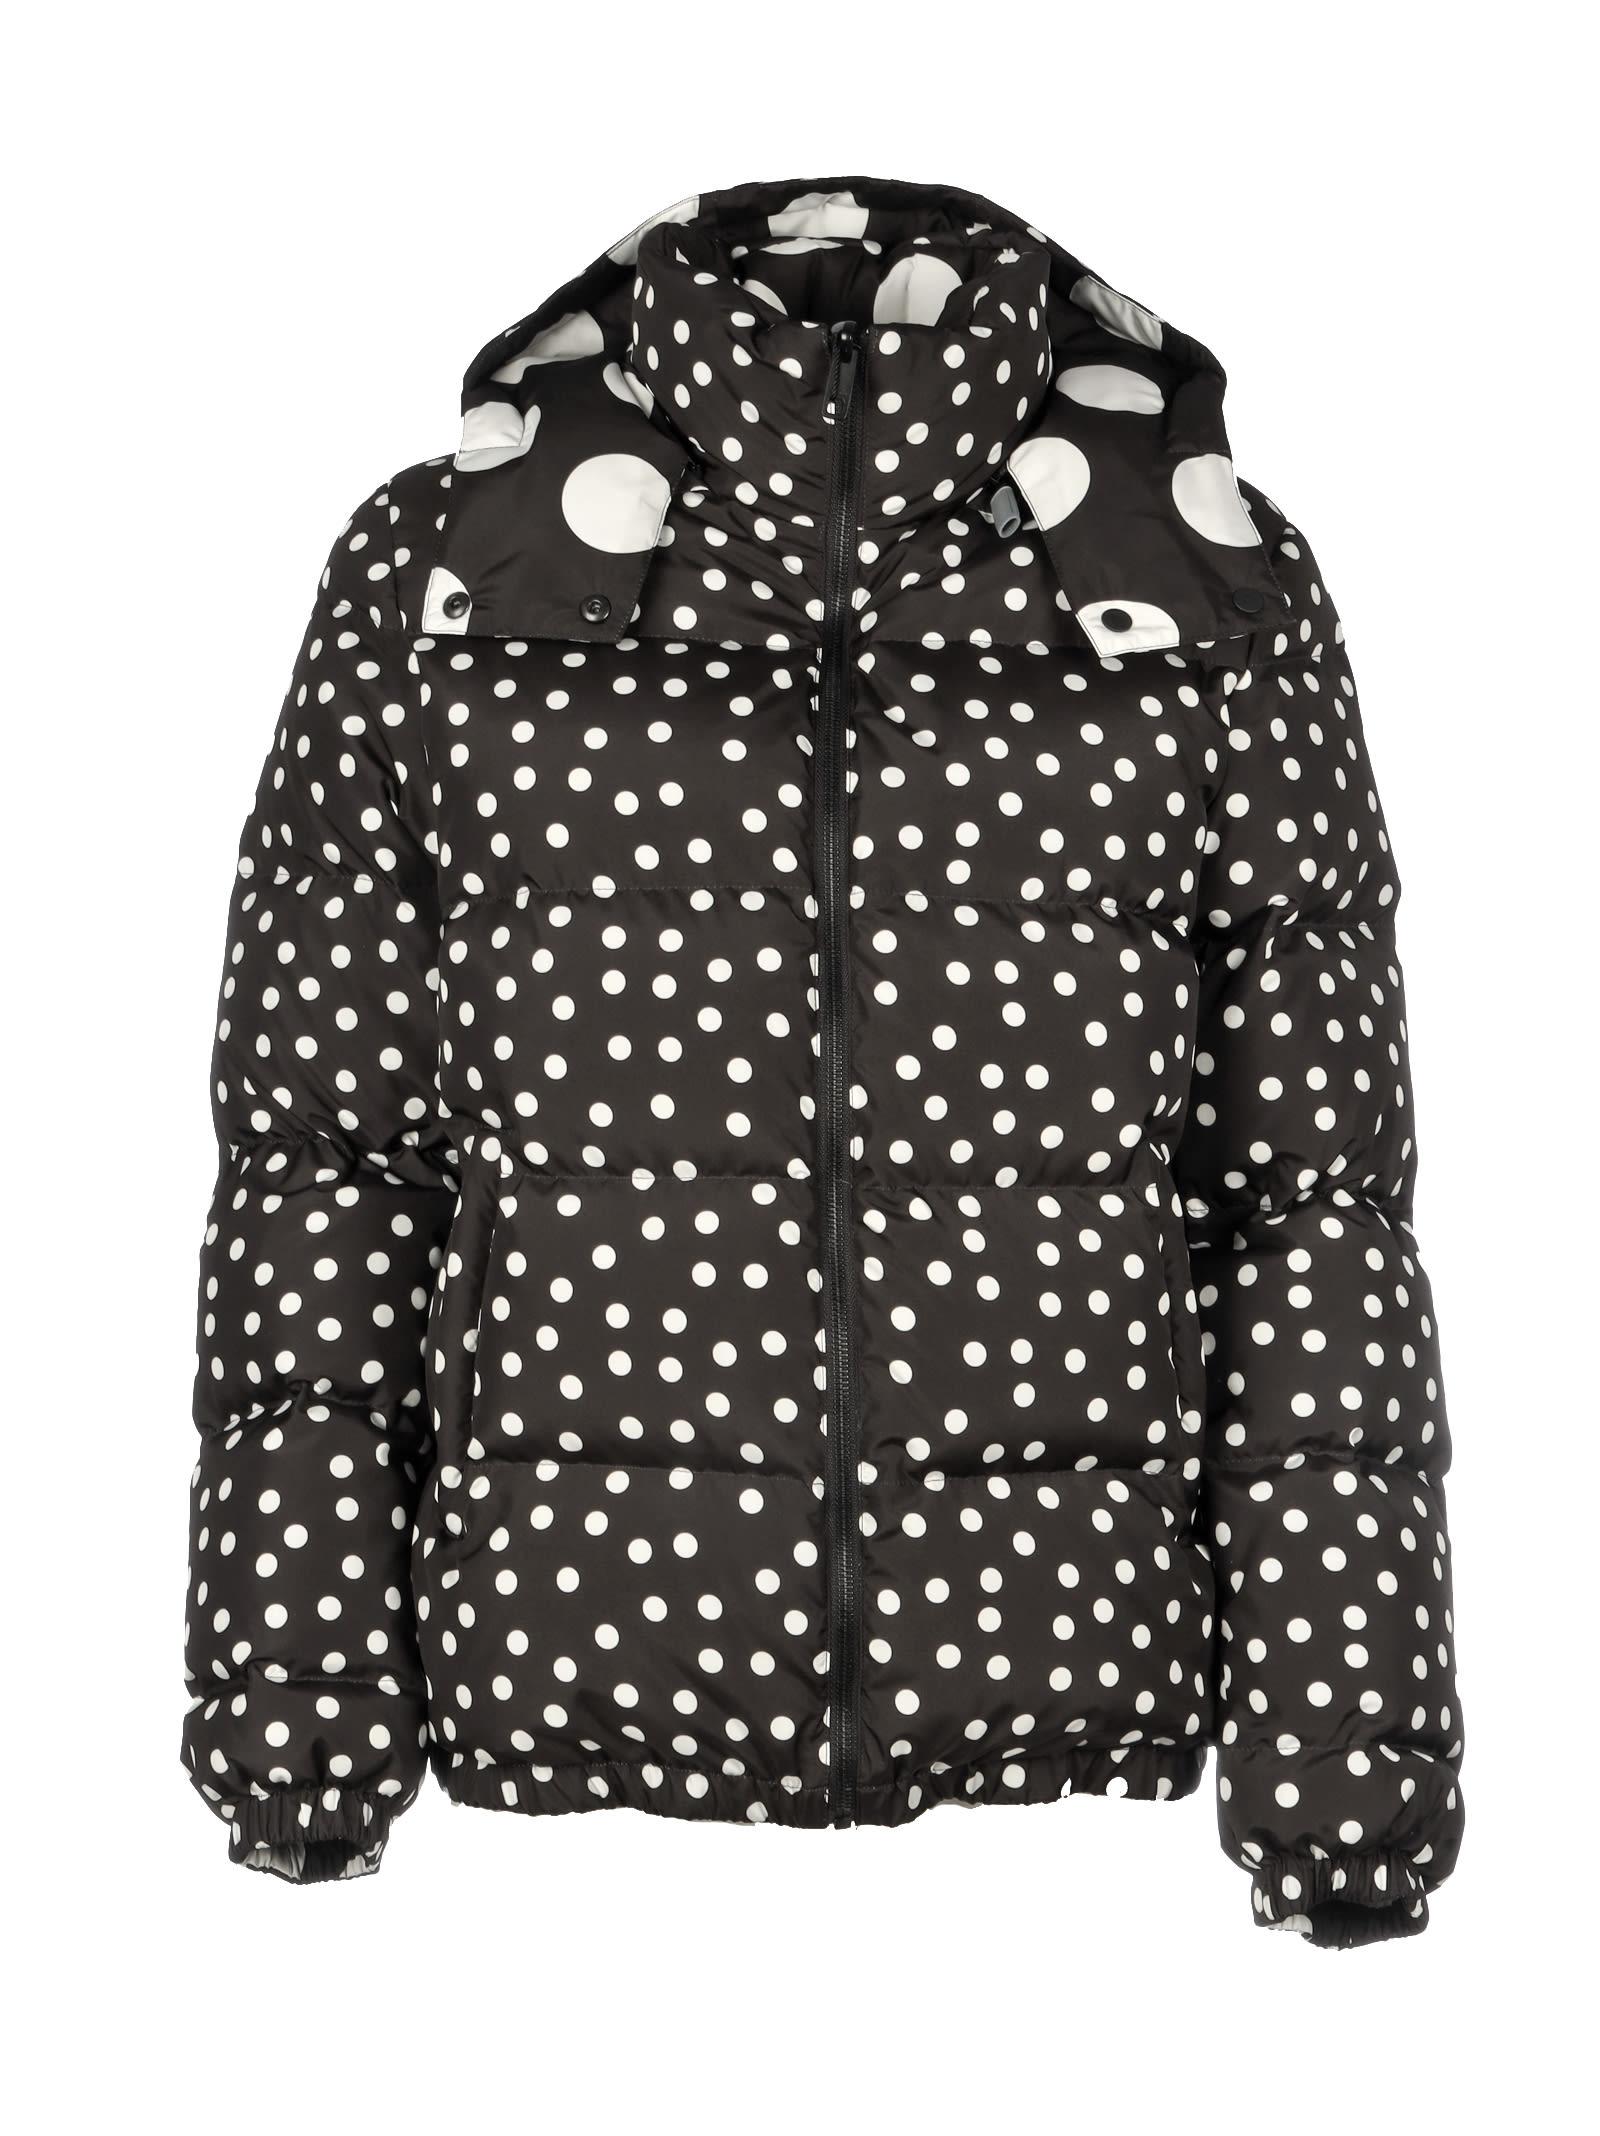 Dolce & Gabbana Print Reversible Pois Jacket